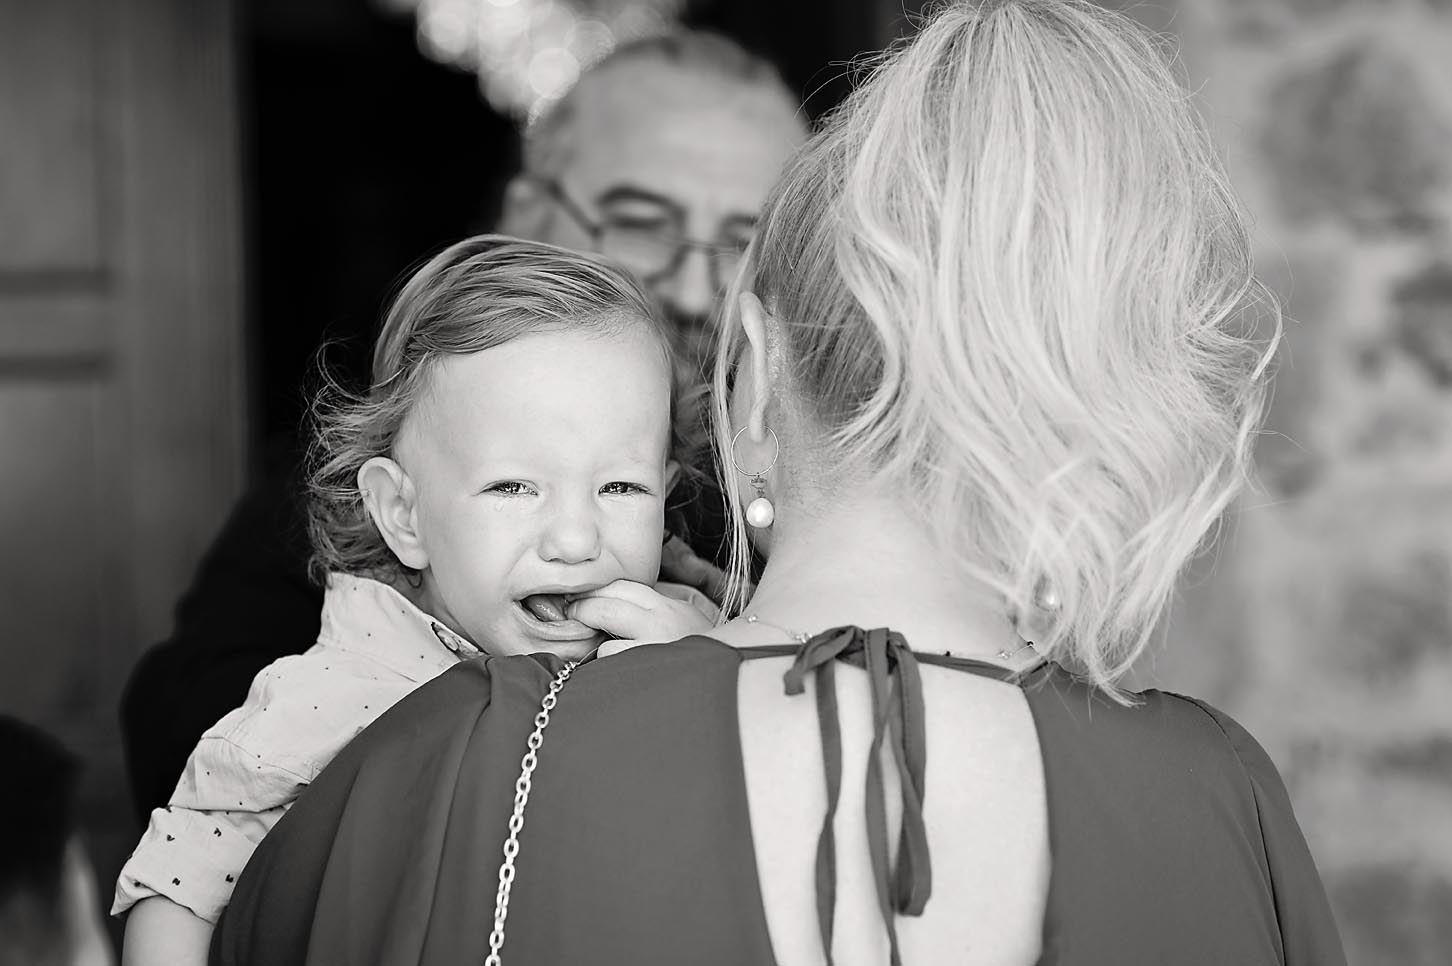 baptism-bw- christening- family-potrtait-alexis-koumaditis-larissa